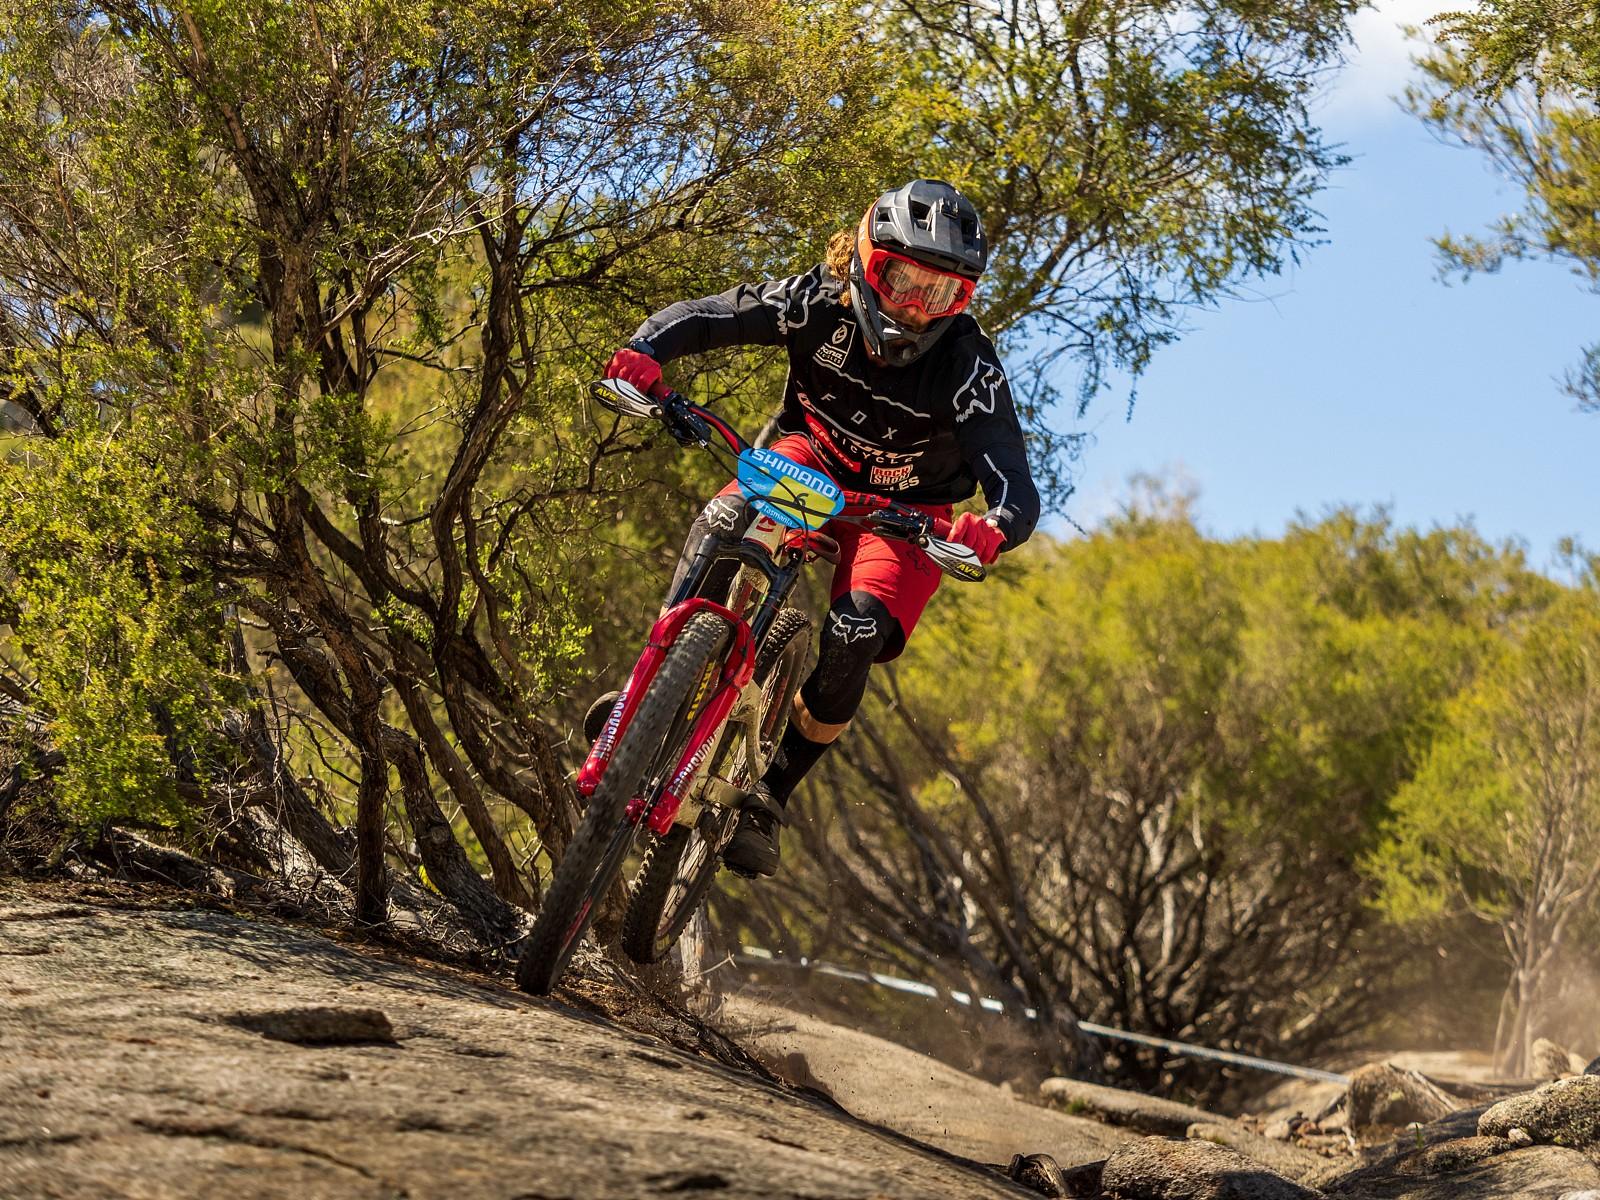 171119-Tassie-1140 - jack.fletcher86 - Mountain Biking Pictures - Vital MTB